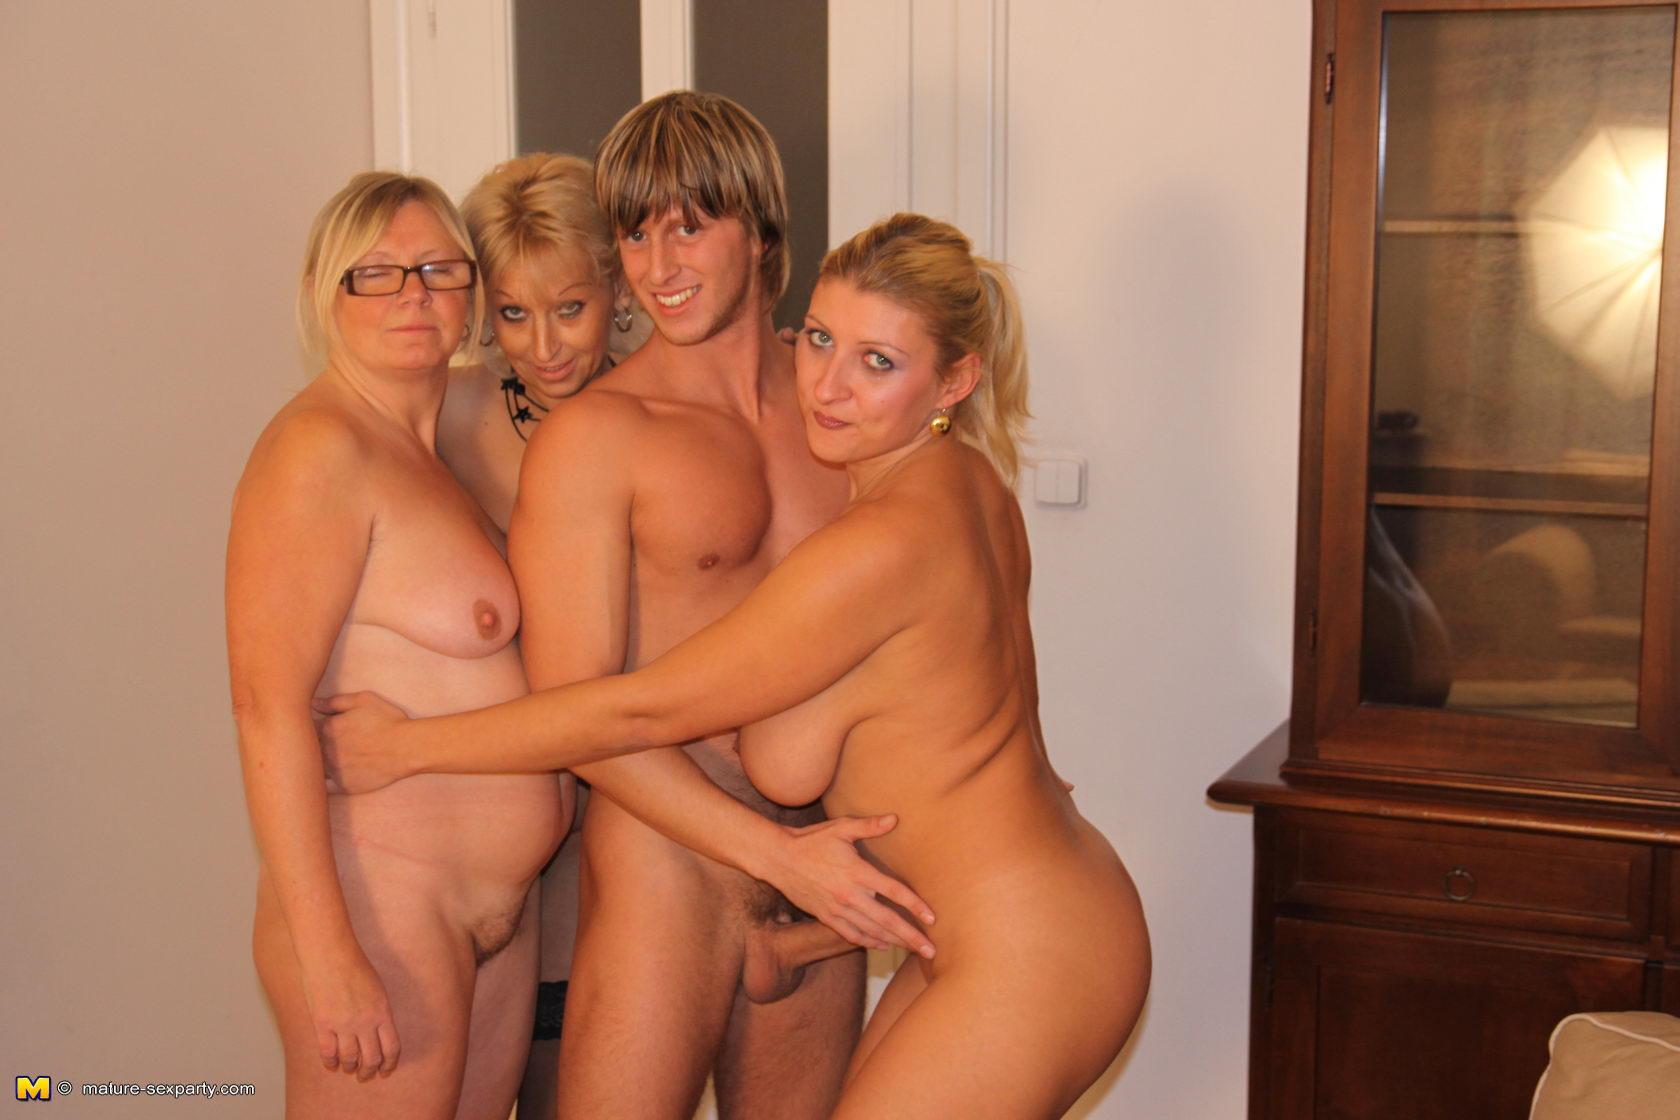 Group nude mature women